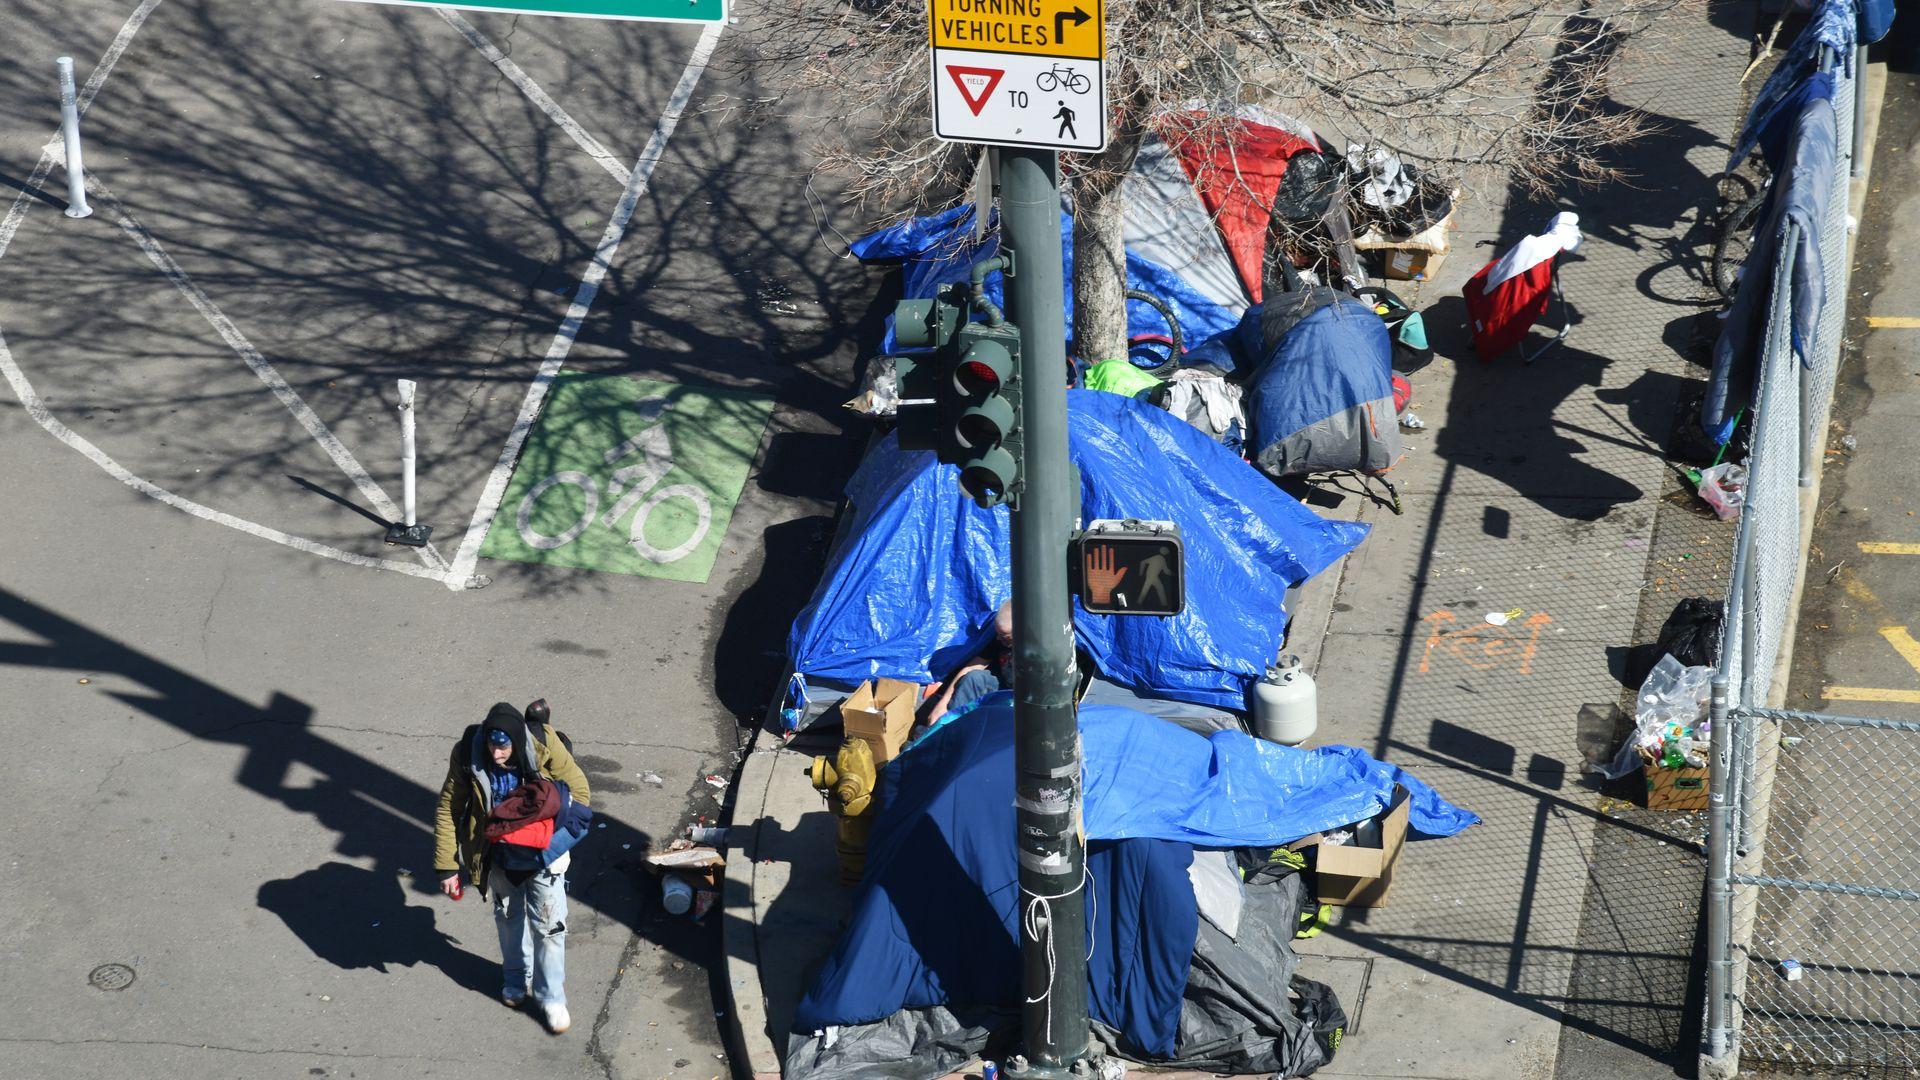 A photo of a homeless encampment in Denver.